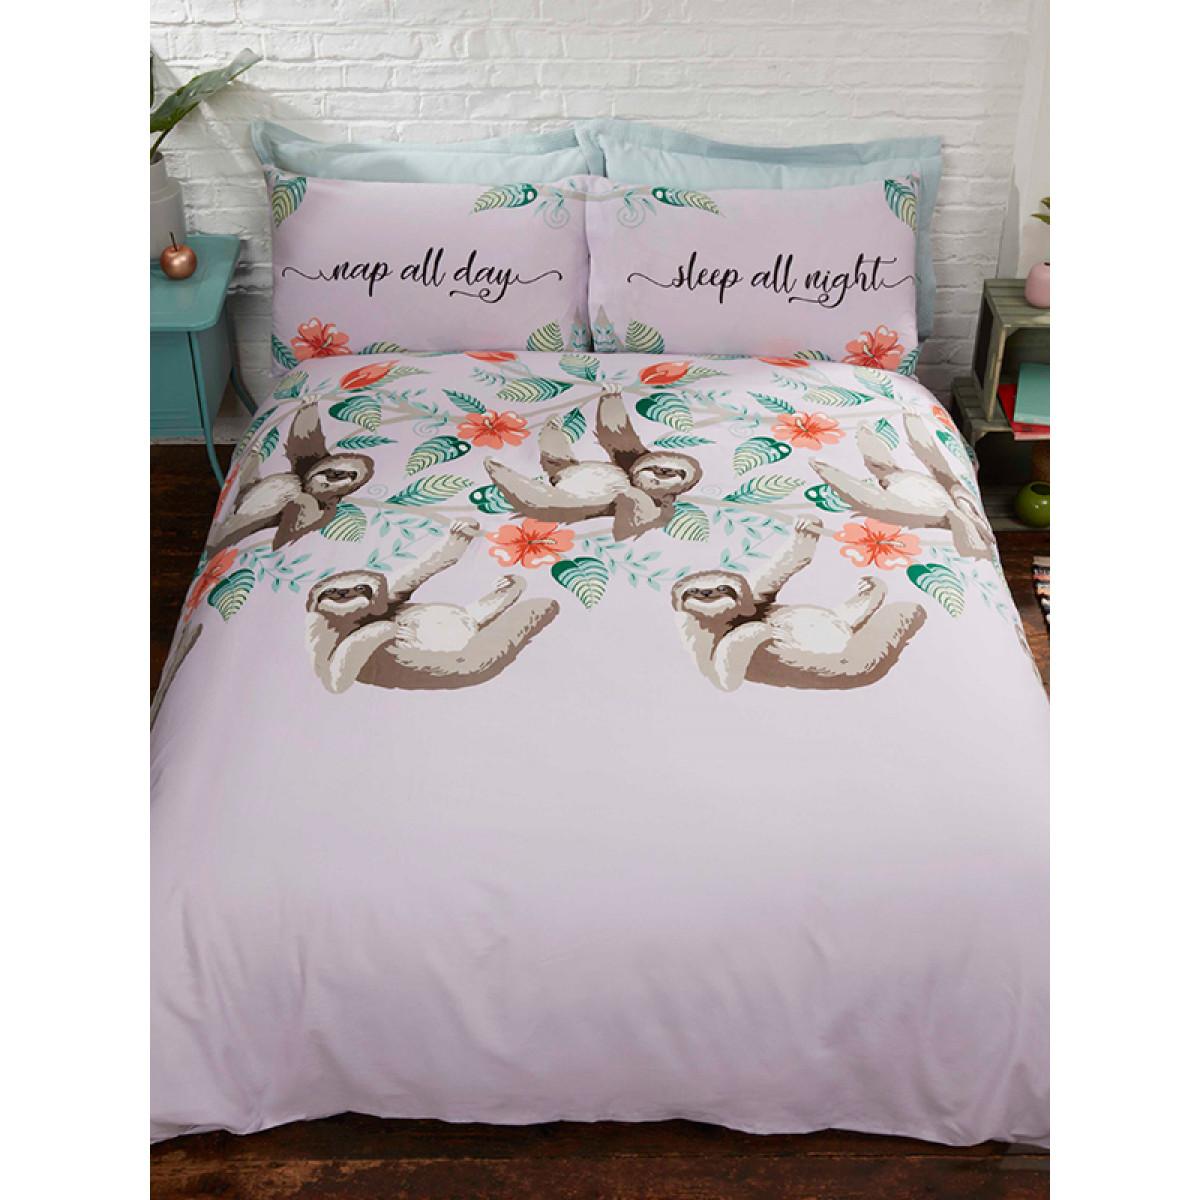 Sloth Single Duvet Cover And Pillowcase Set Bedroom